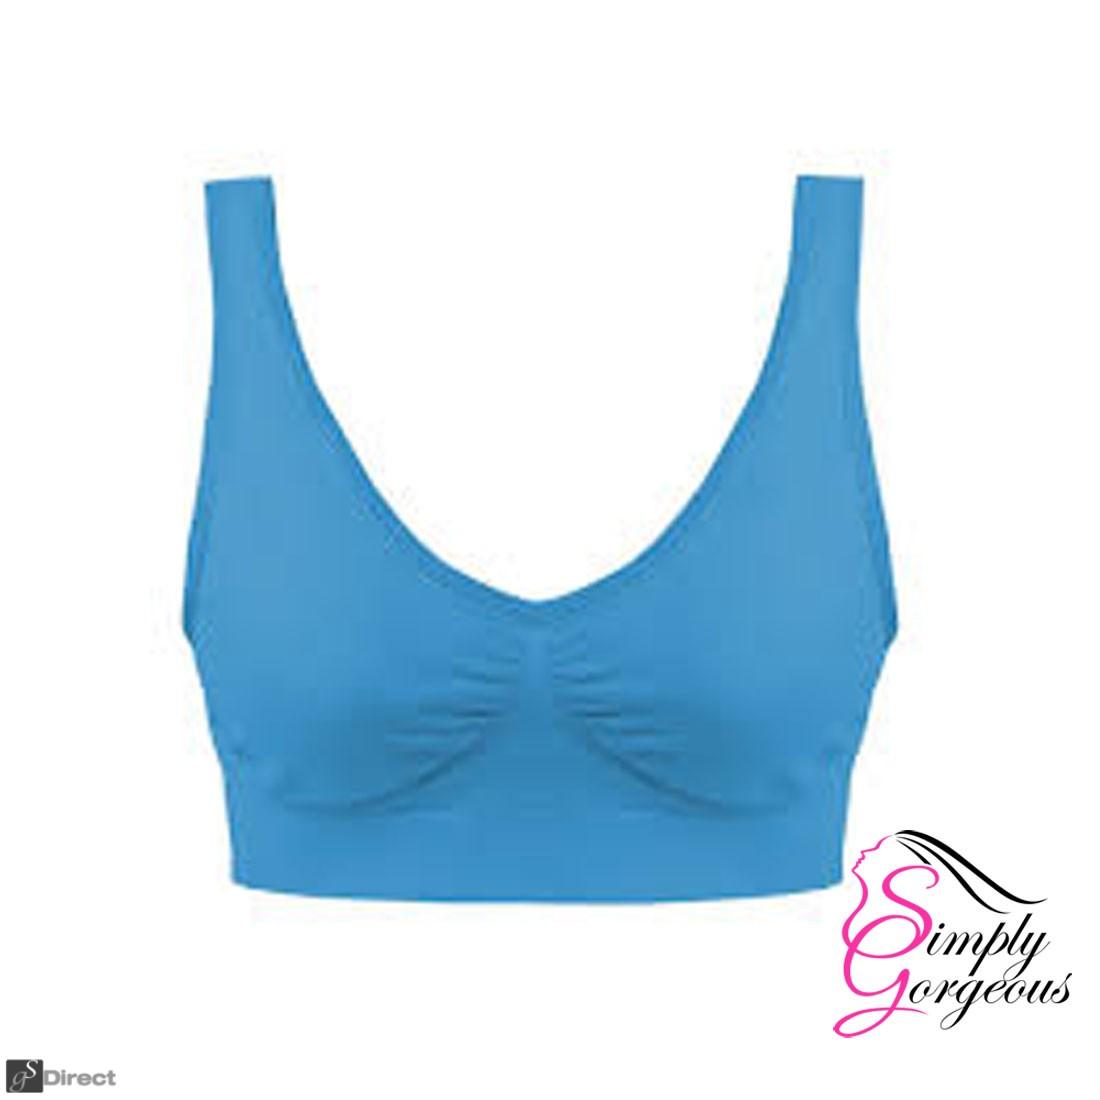 Simply Gorgeous Ultra Comfort Seamless Sport Style Bra - Blue - M